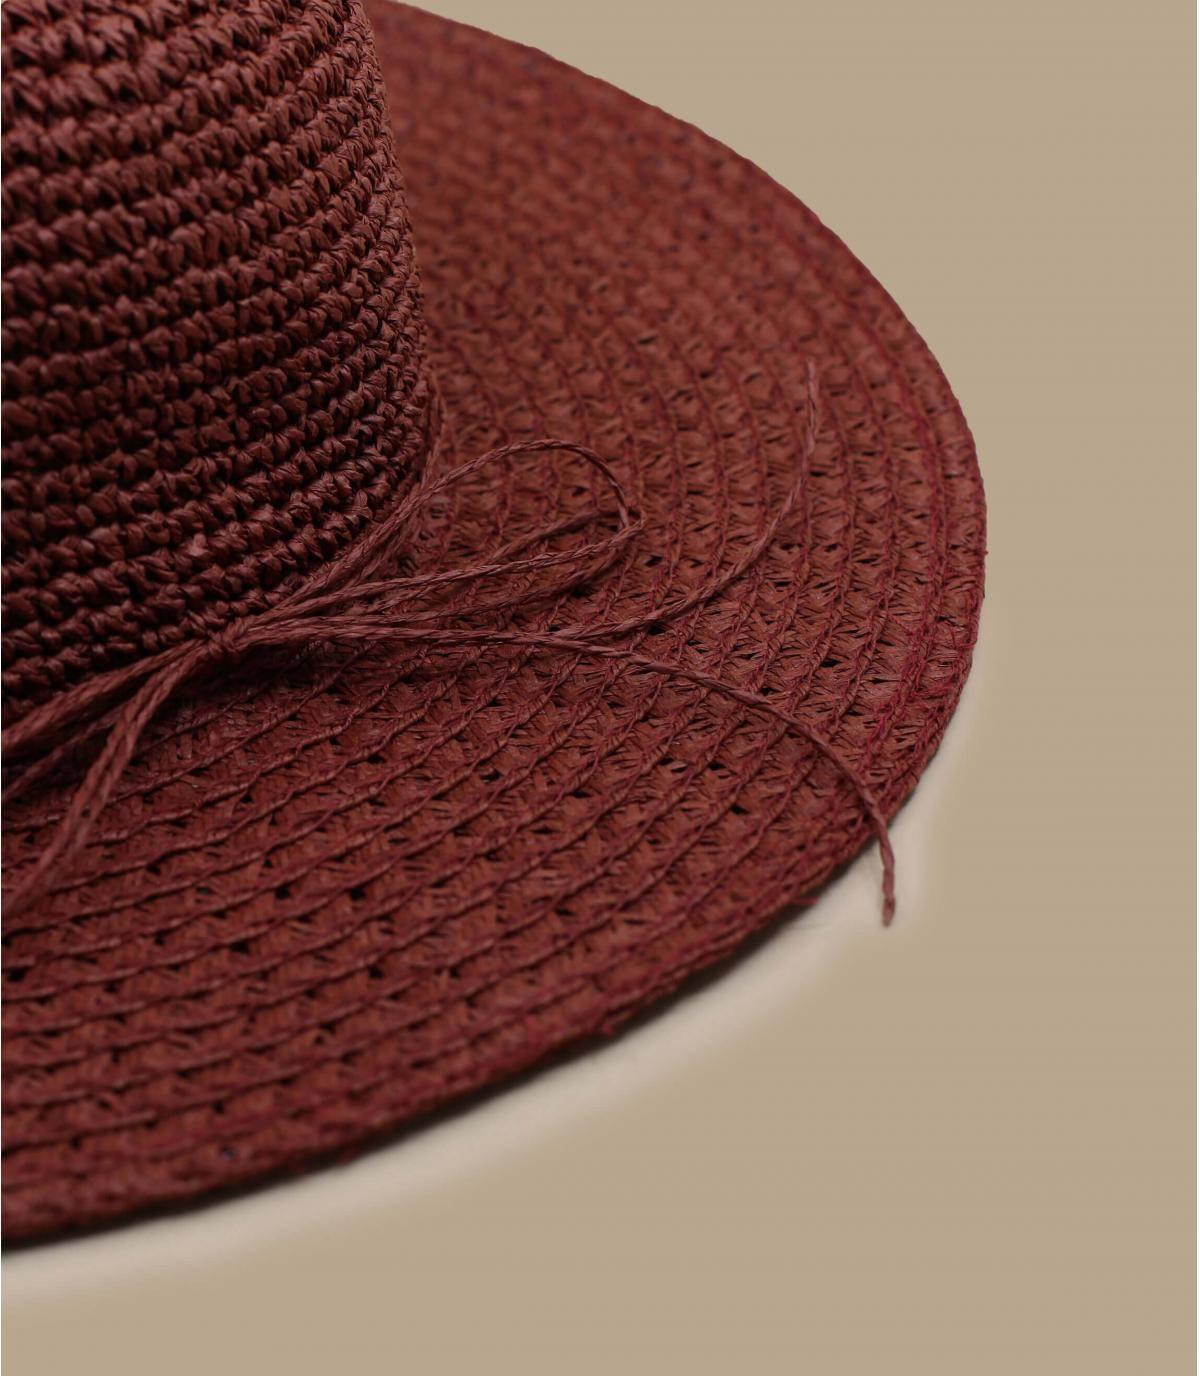 Details Paper Crochet Floppy cassis - afbeeling 3